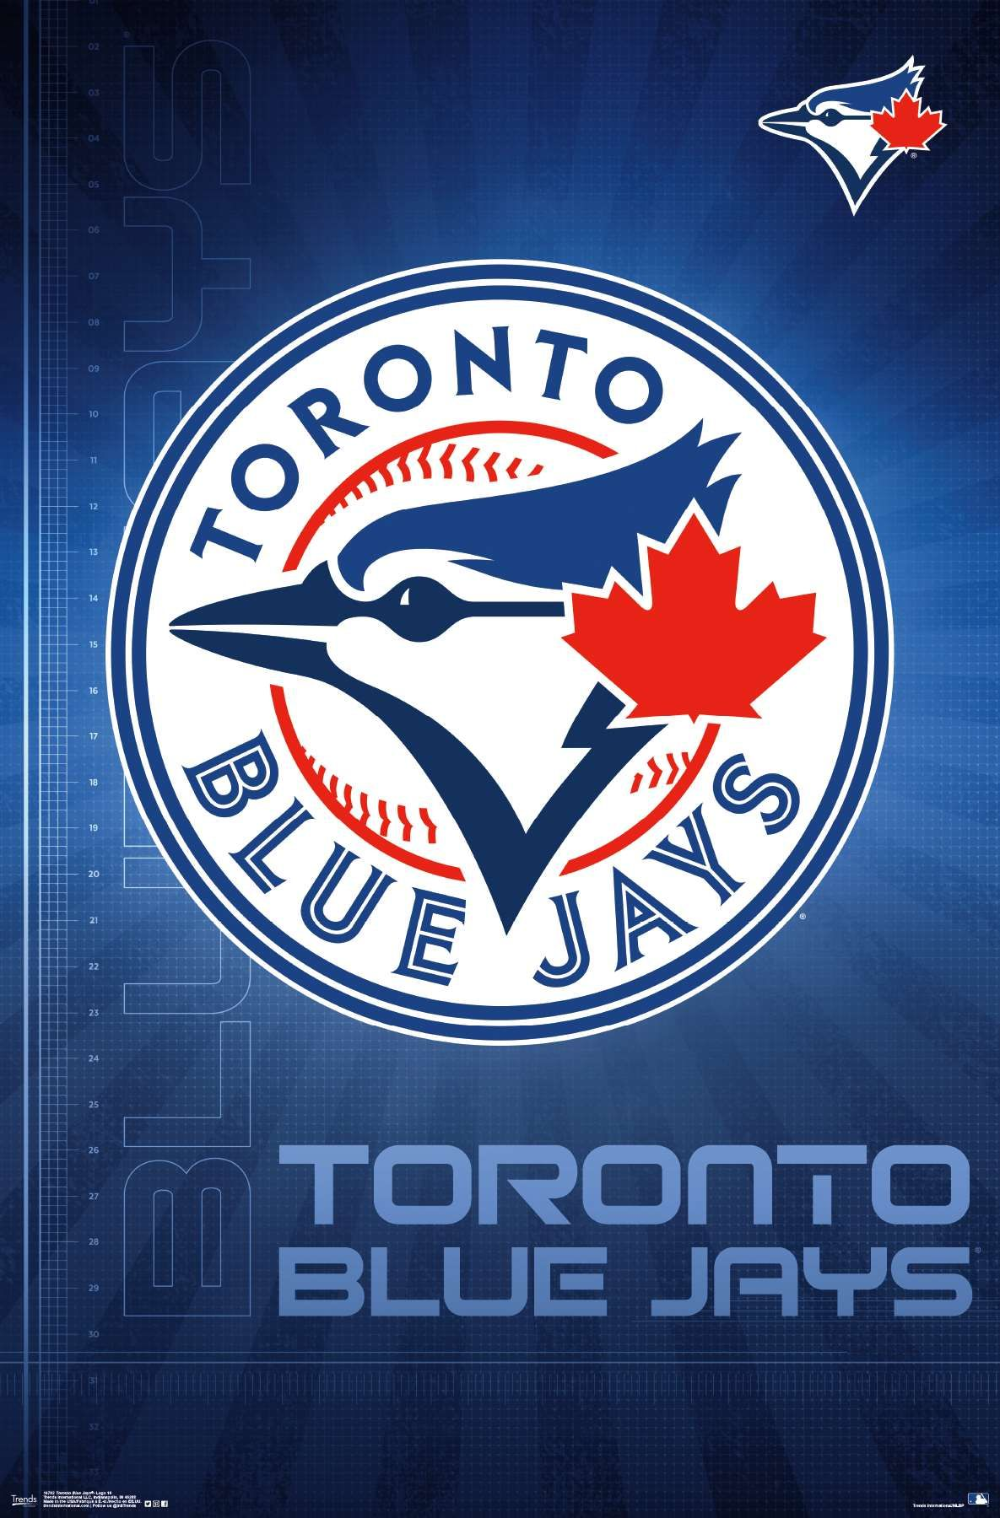 Mlb Toronto Blue Jays Logo 16 Toronto Blue Jays Logo Blue Jays Baseball Blue Jays